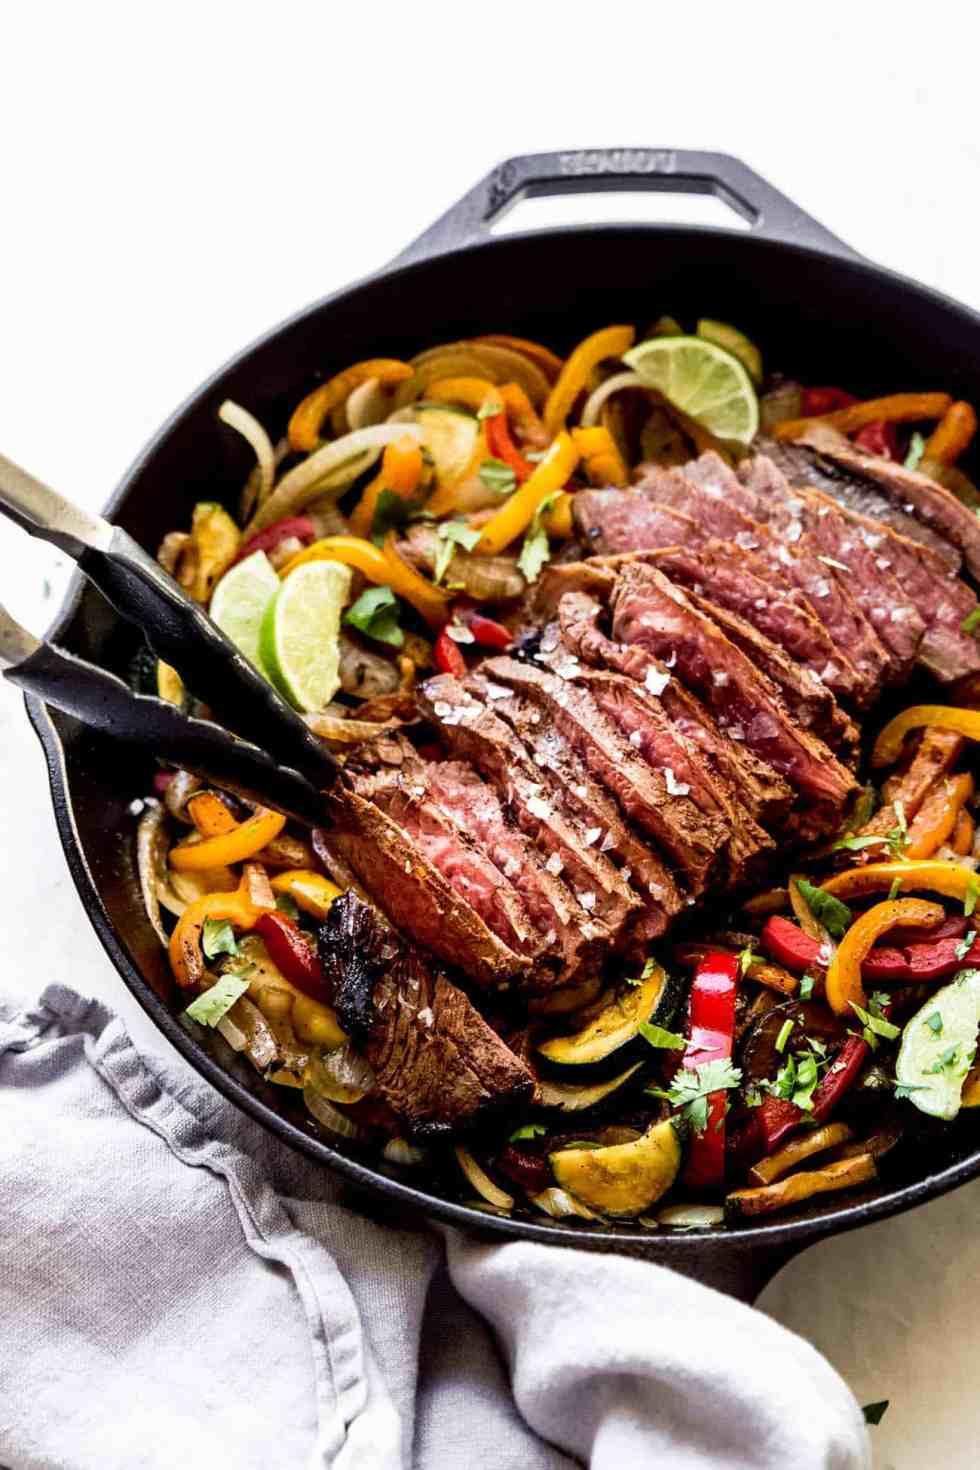 tongs picking up steak fajitas out of a cast iron pan